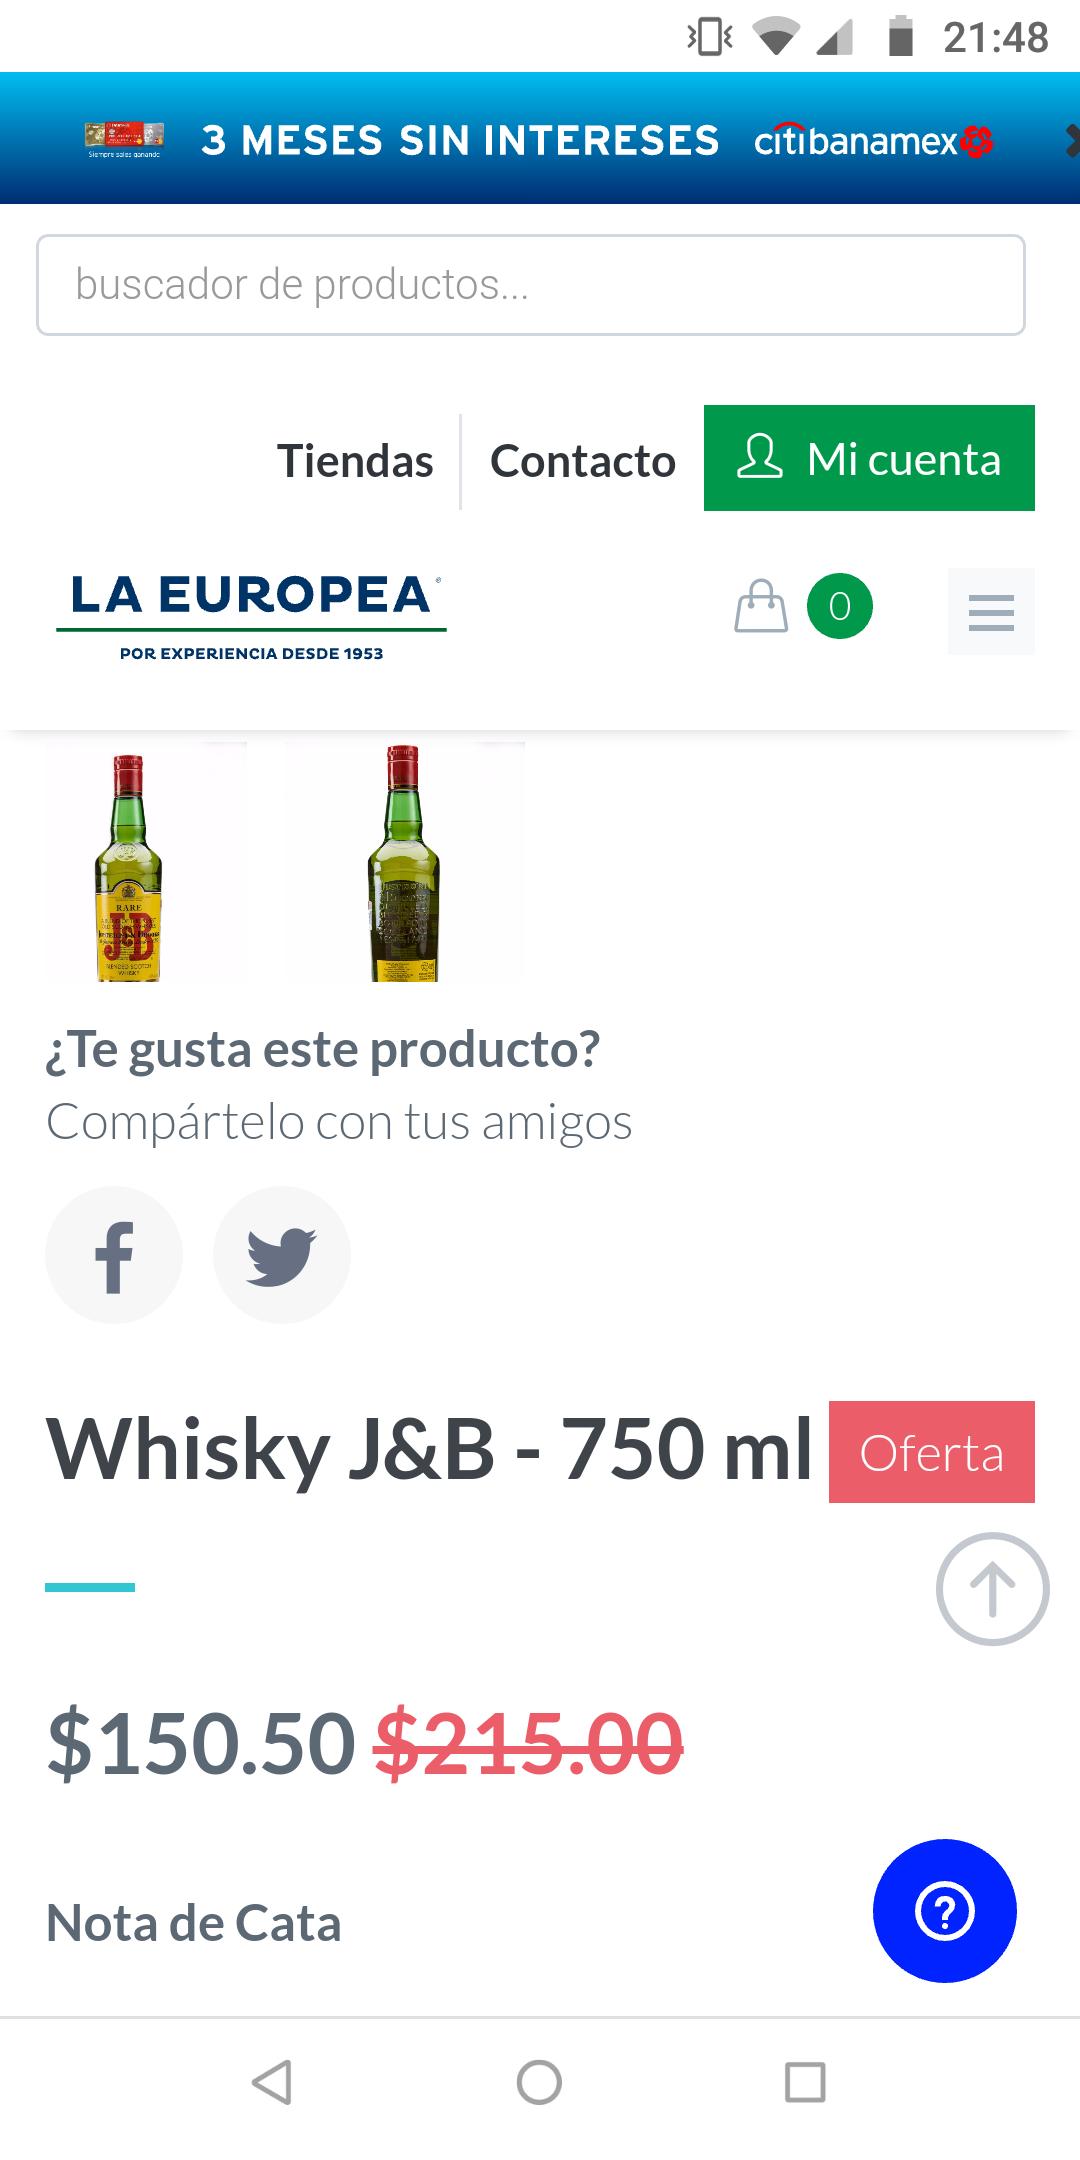 La Europea: Whisky J&B 750 ml